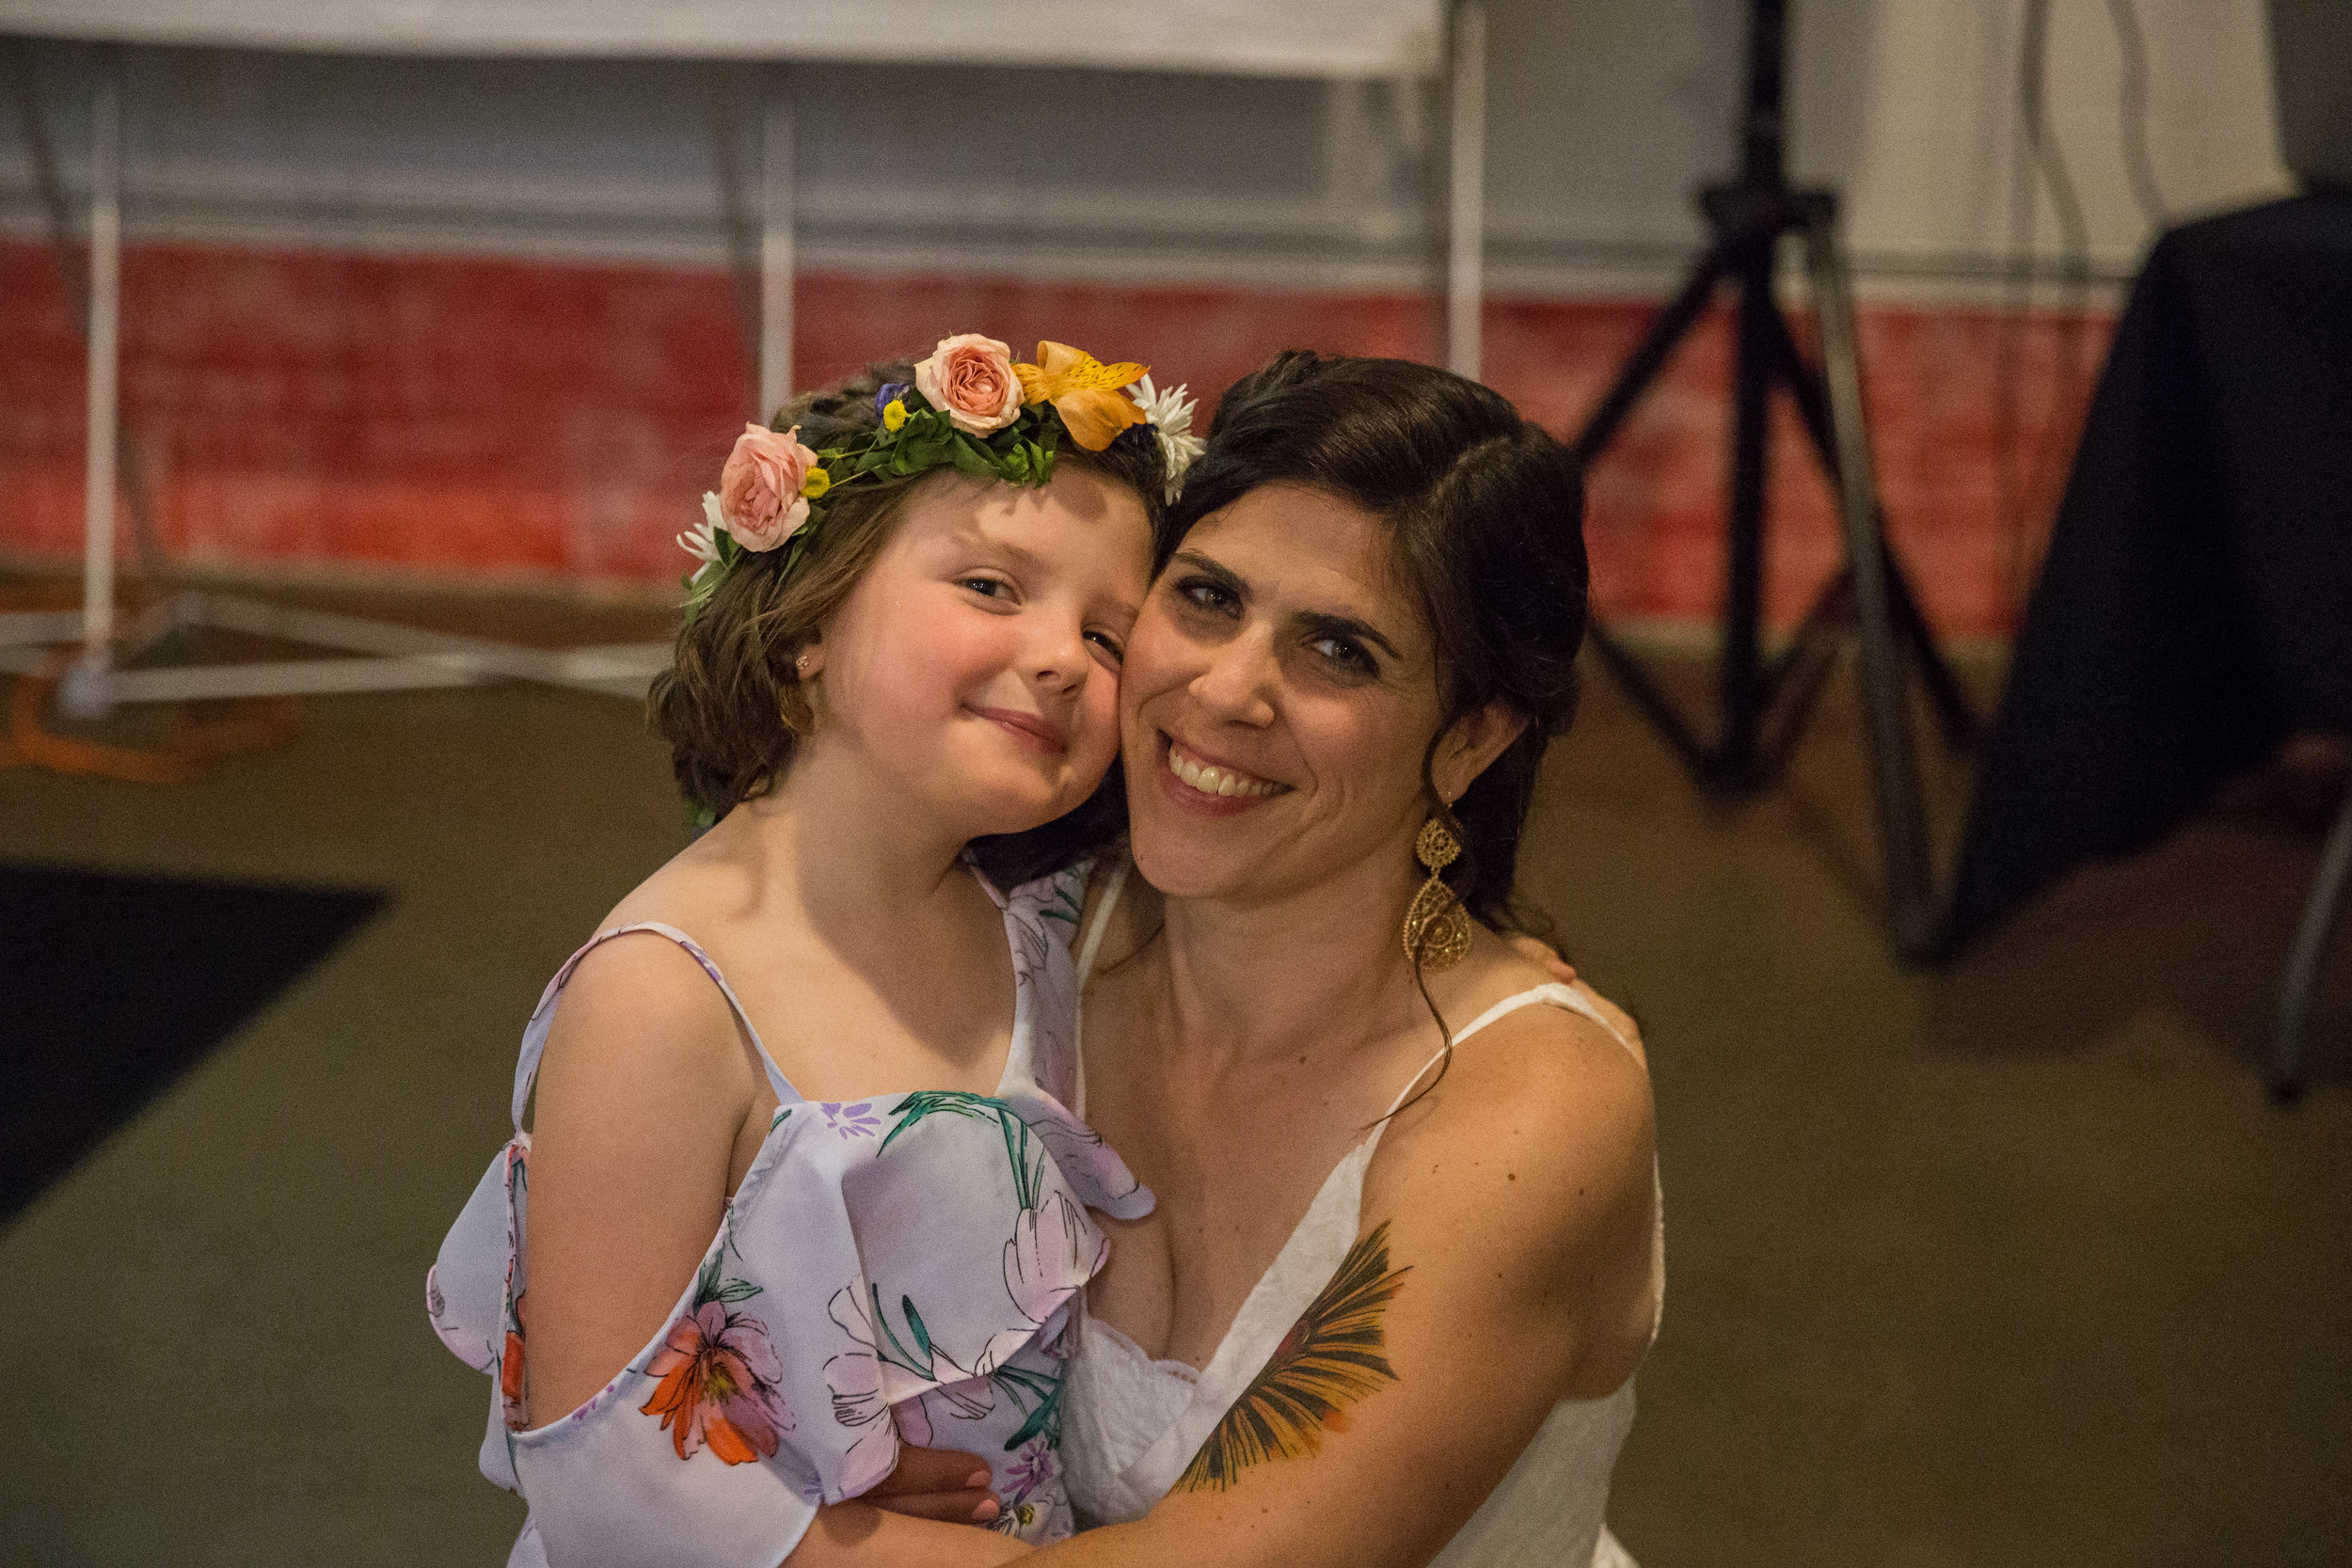 Natalie and Dallas Mooney Wedding 6-8-19_Tania Watt Photography-567.jpg